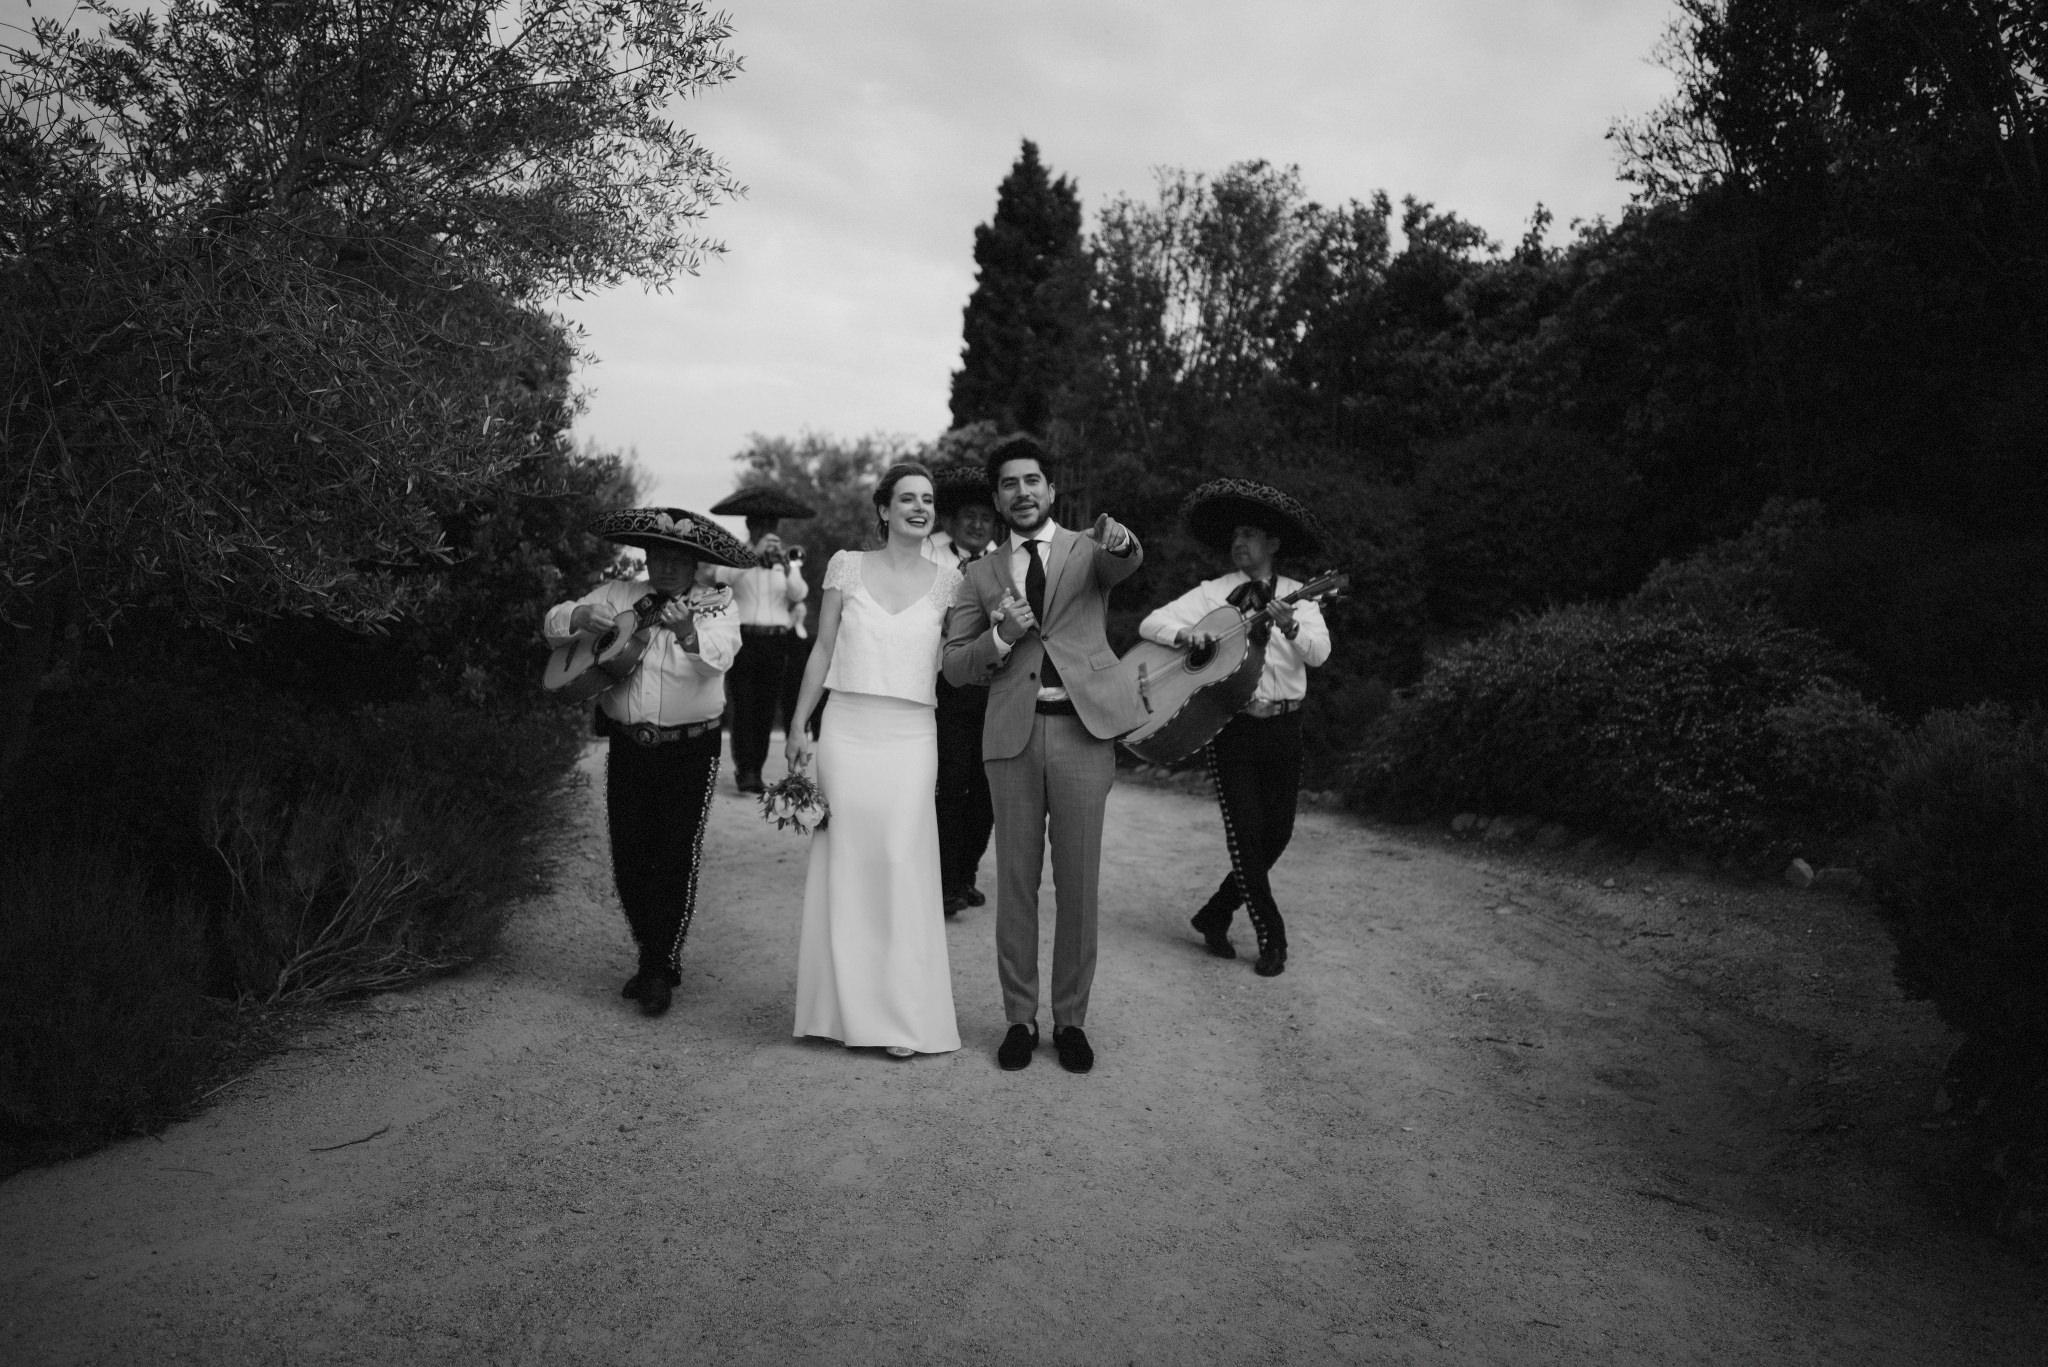 Bruidsfotograaf Spanje Castle d'Emporda destination wedding Naomi van der Kraan00045.jpg